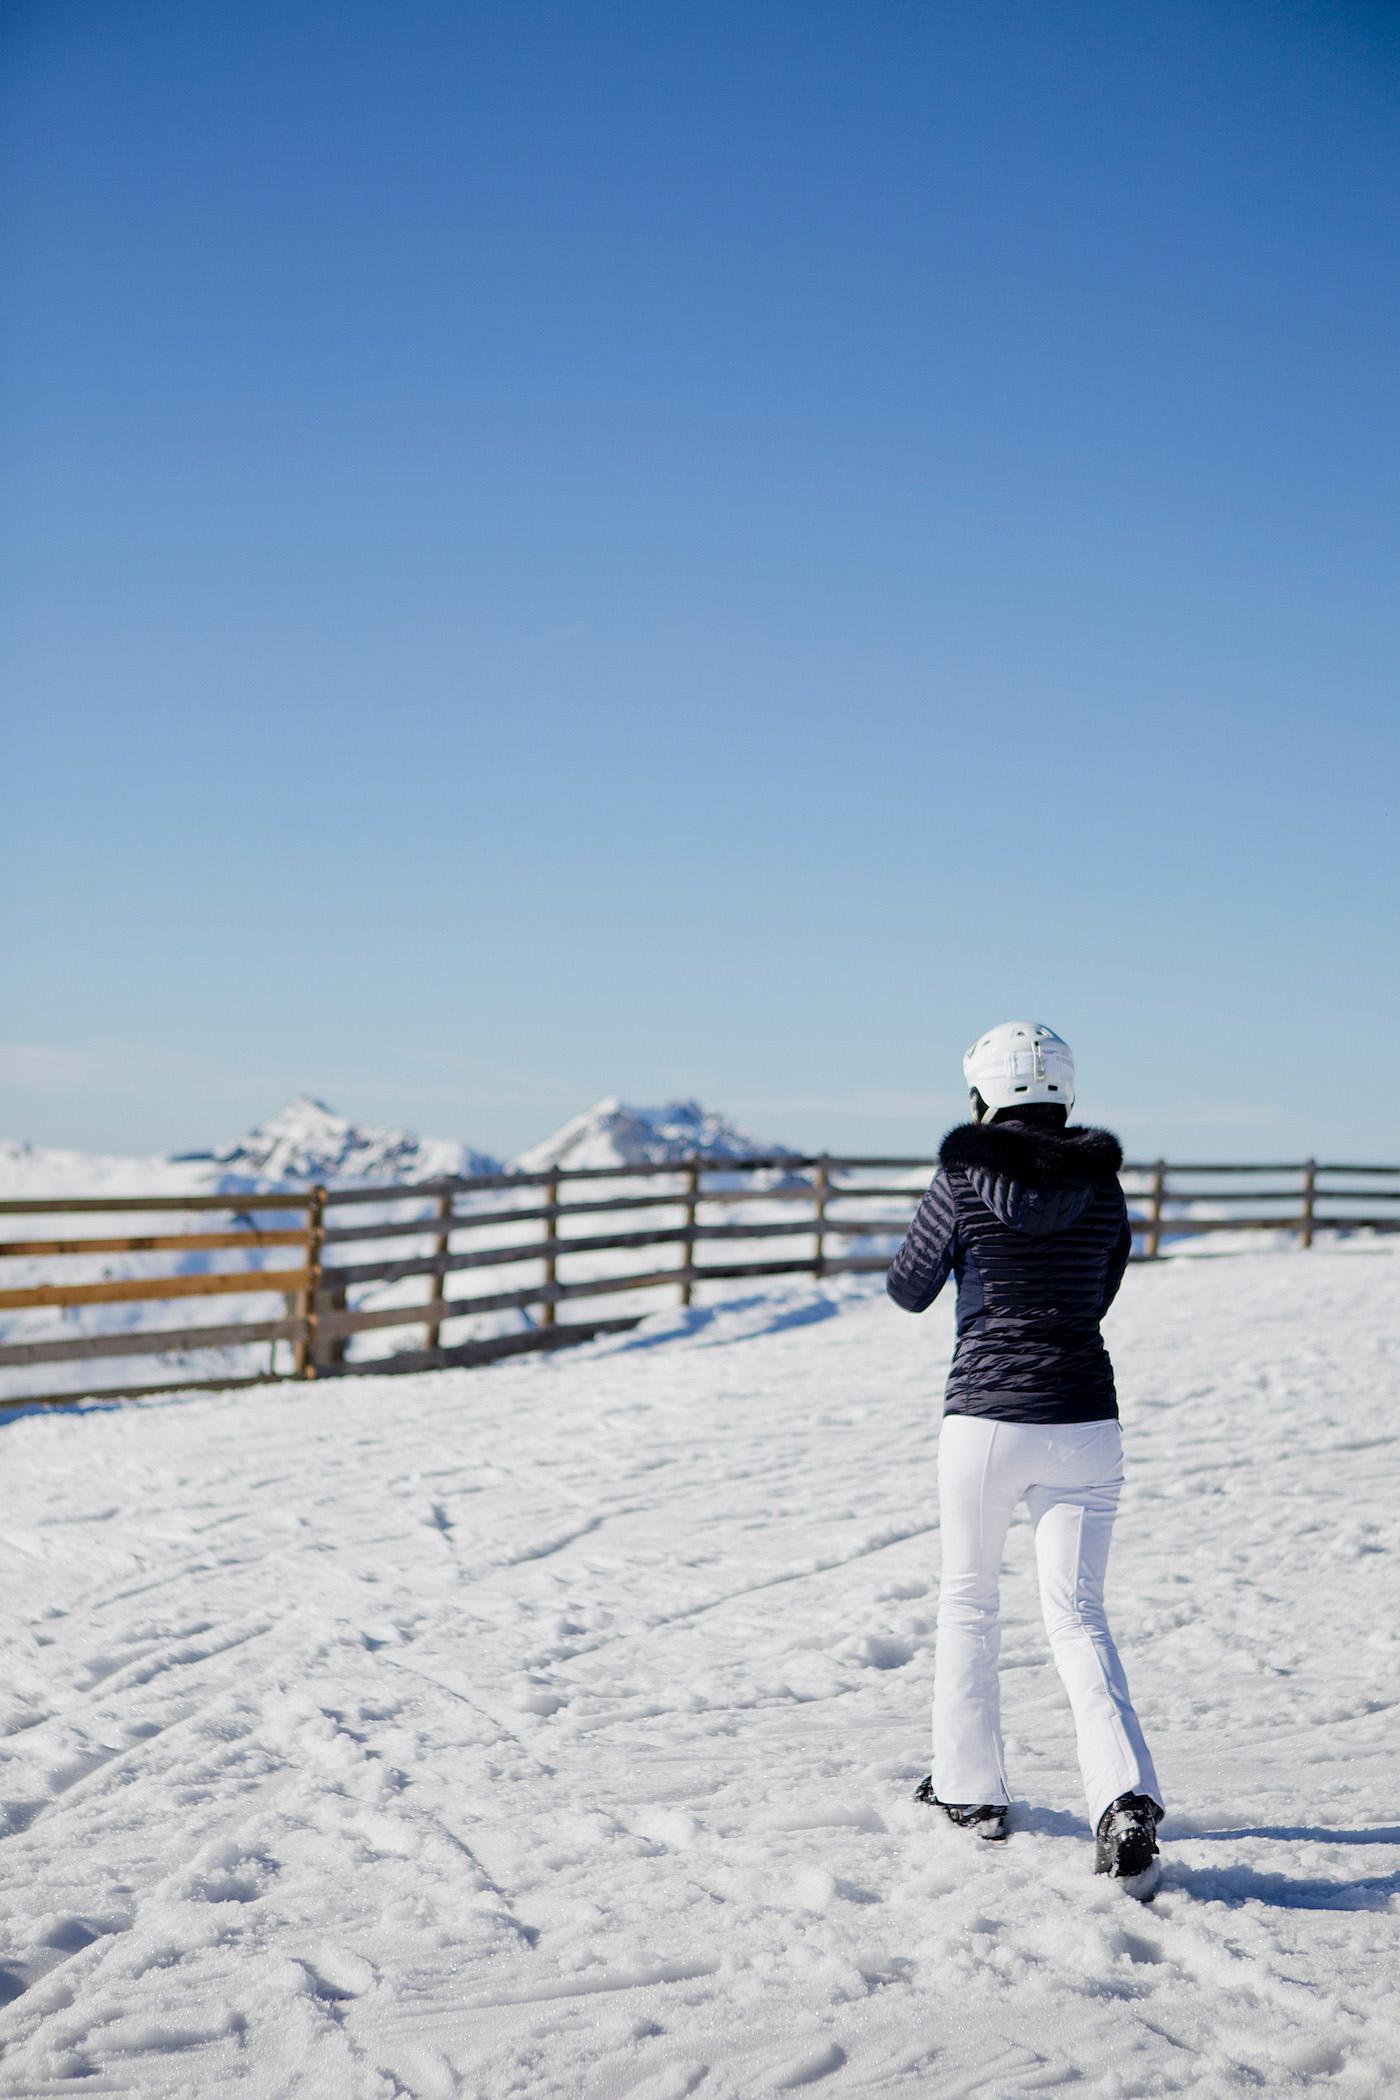 www.thegoldenbun.com |Ski Wochenende in Saalbach Hinterglemm Leogang